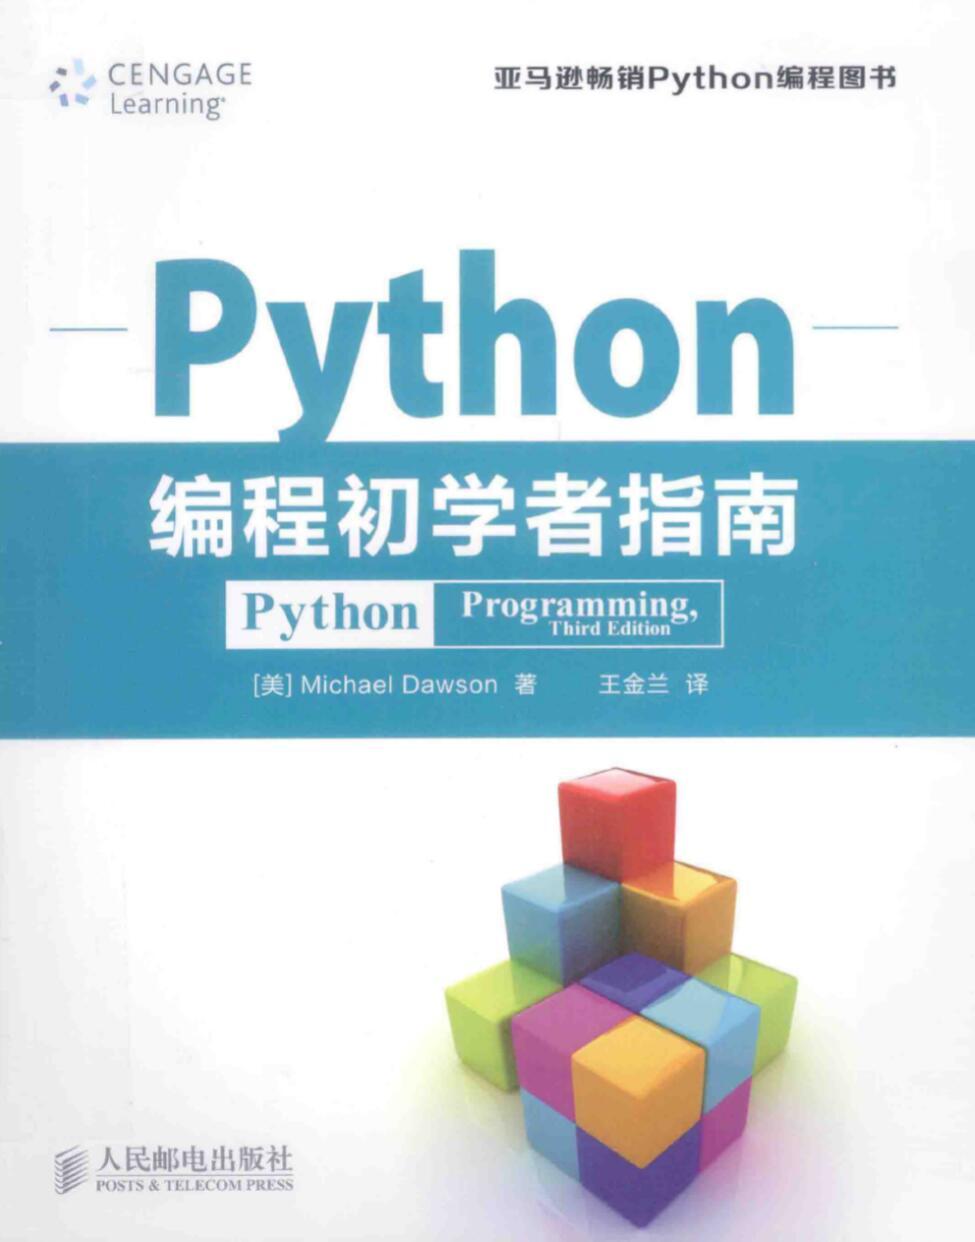 Python编程初学者指南书籍和Python零基础快乐学习之旅